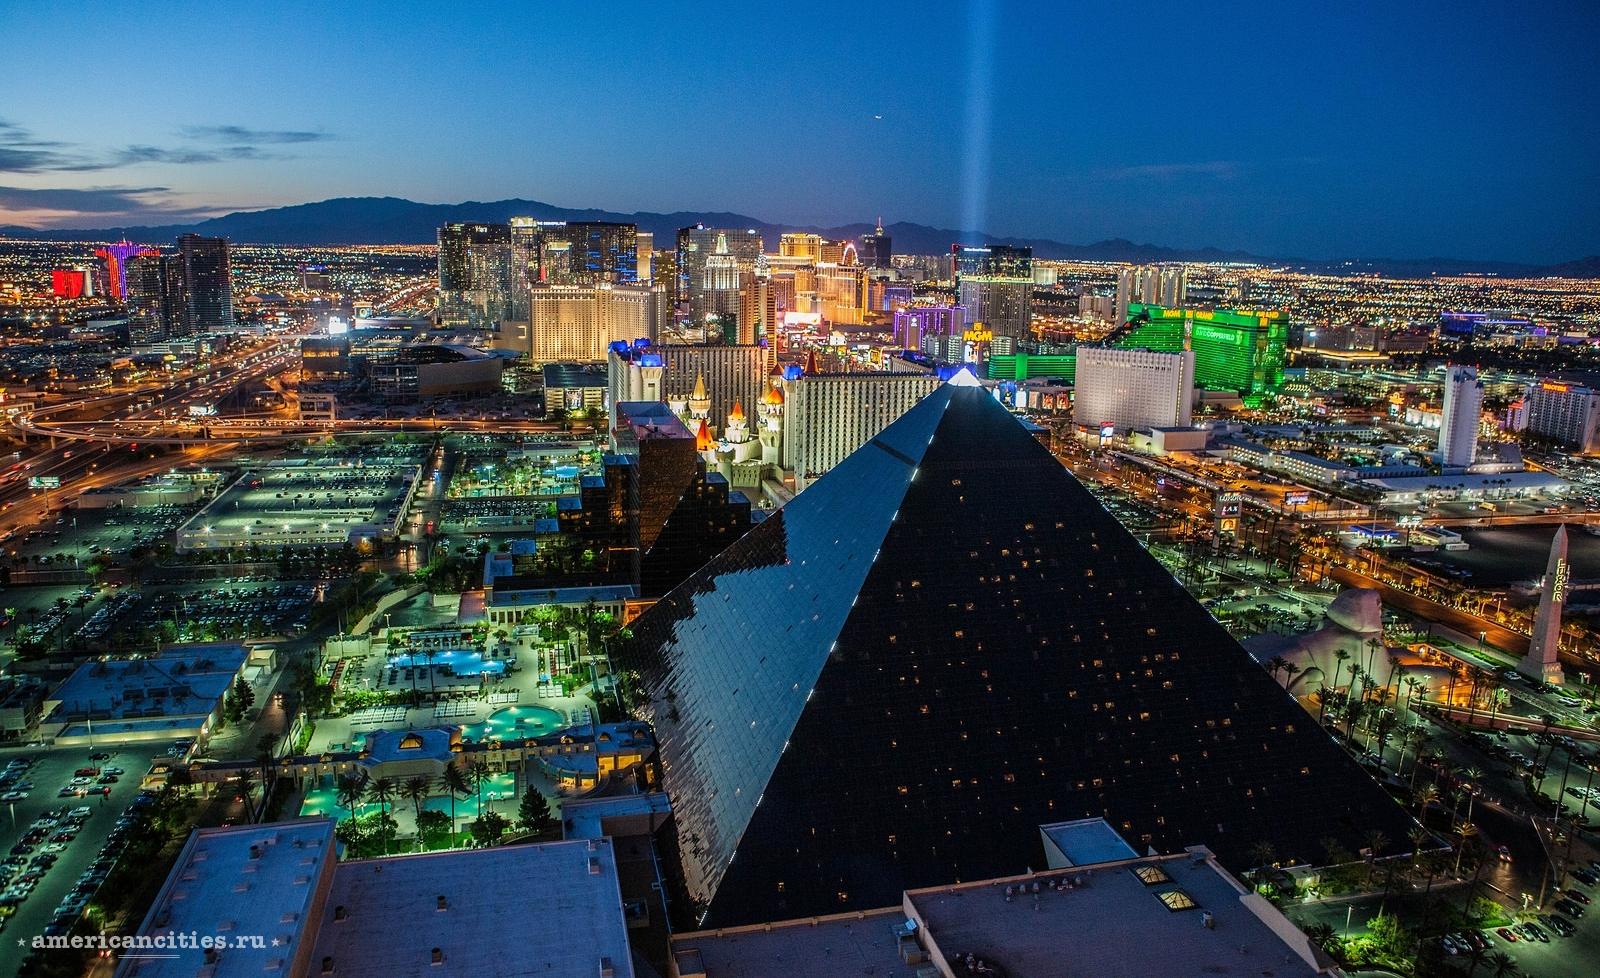 Вид на ночной Лас-Вегас. На переднем плане пирамида Луксор